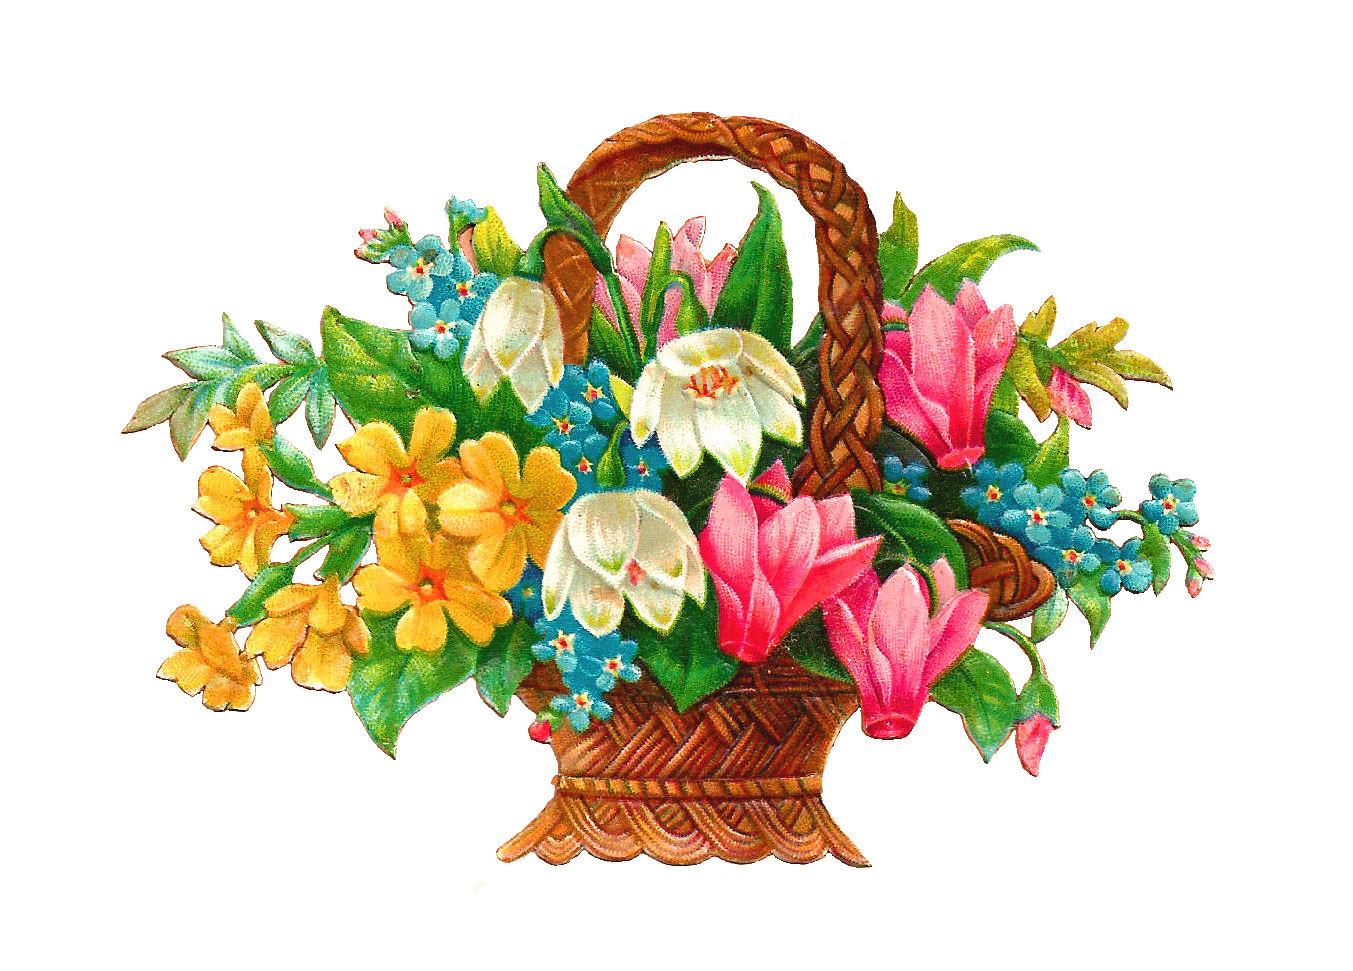 Antique Images: Free Flower Basket Clip Art: 2 Wicket Baskets Full.